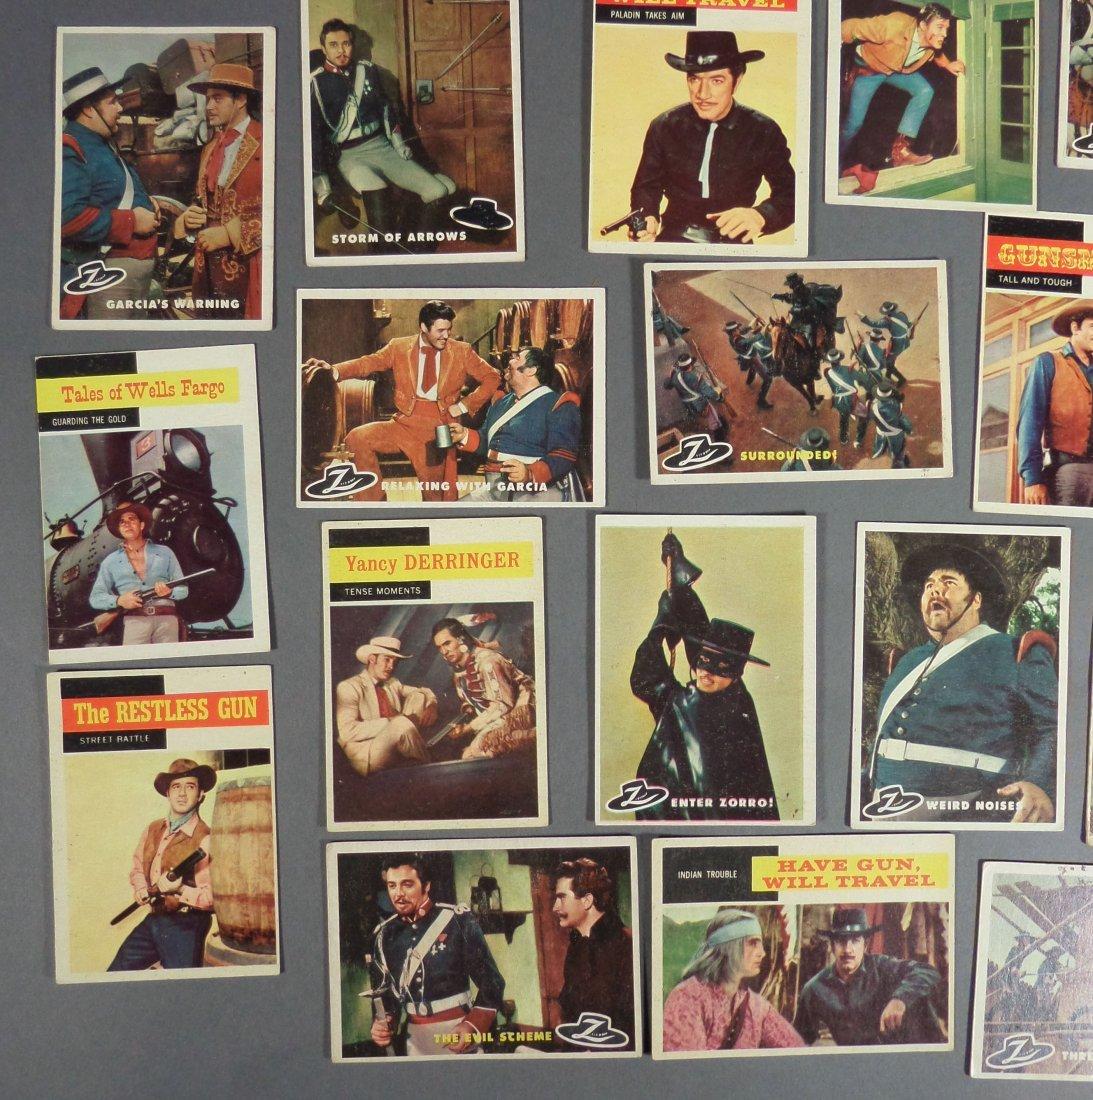 1960s Zorro & TV Trading Cards, Gunsmoke - 2